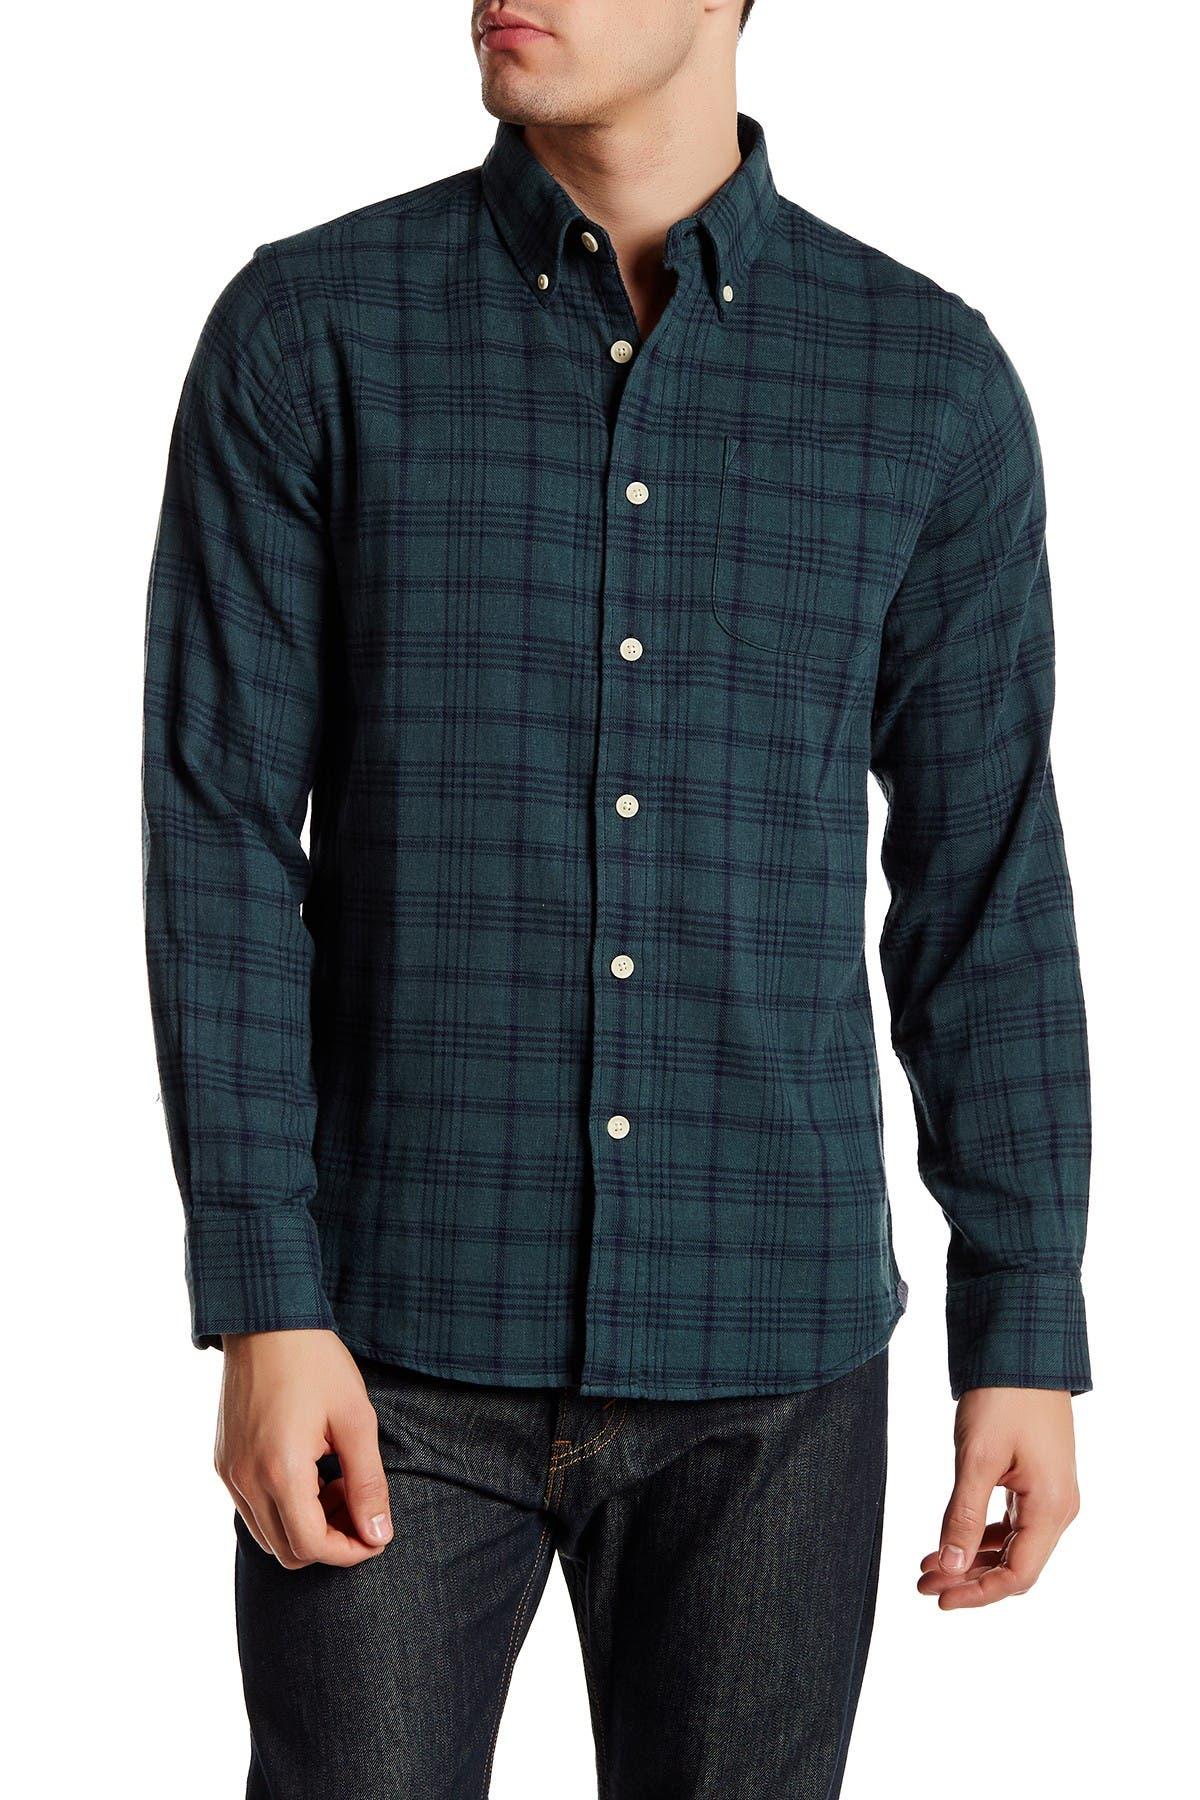 Image of Grayers Regular Fit Plaid Flannel Shirt